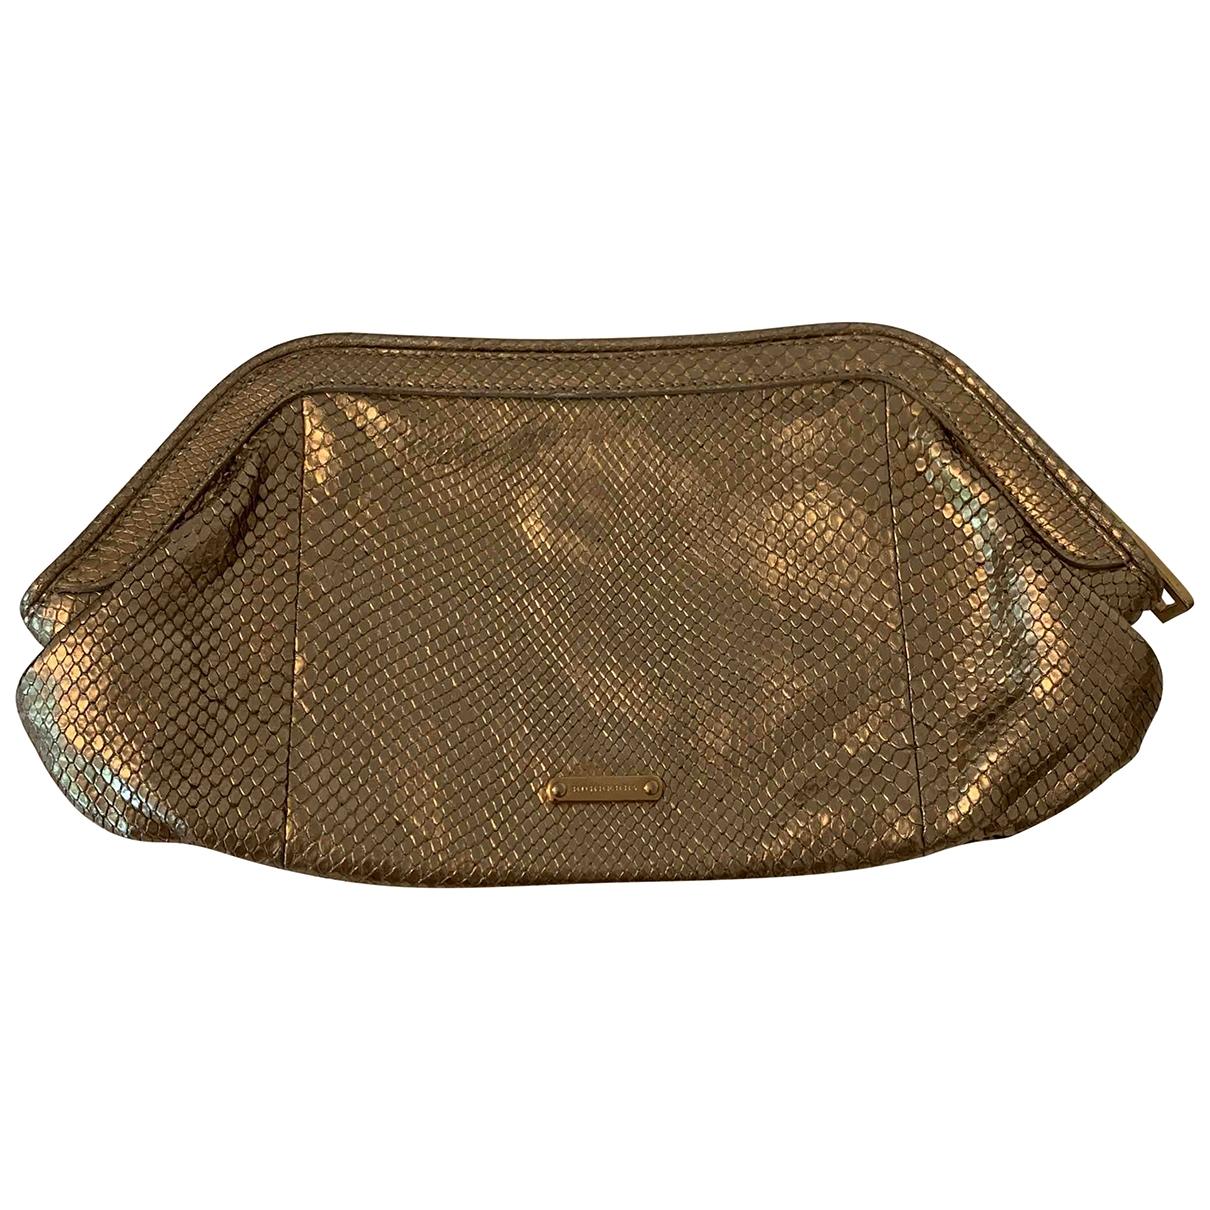 Burberry \N Metallic Leather Clutch bag for Women \N